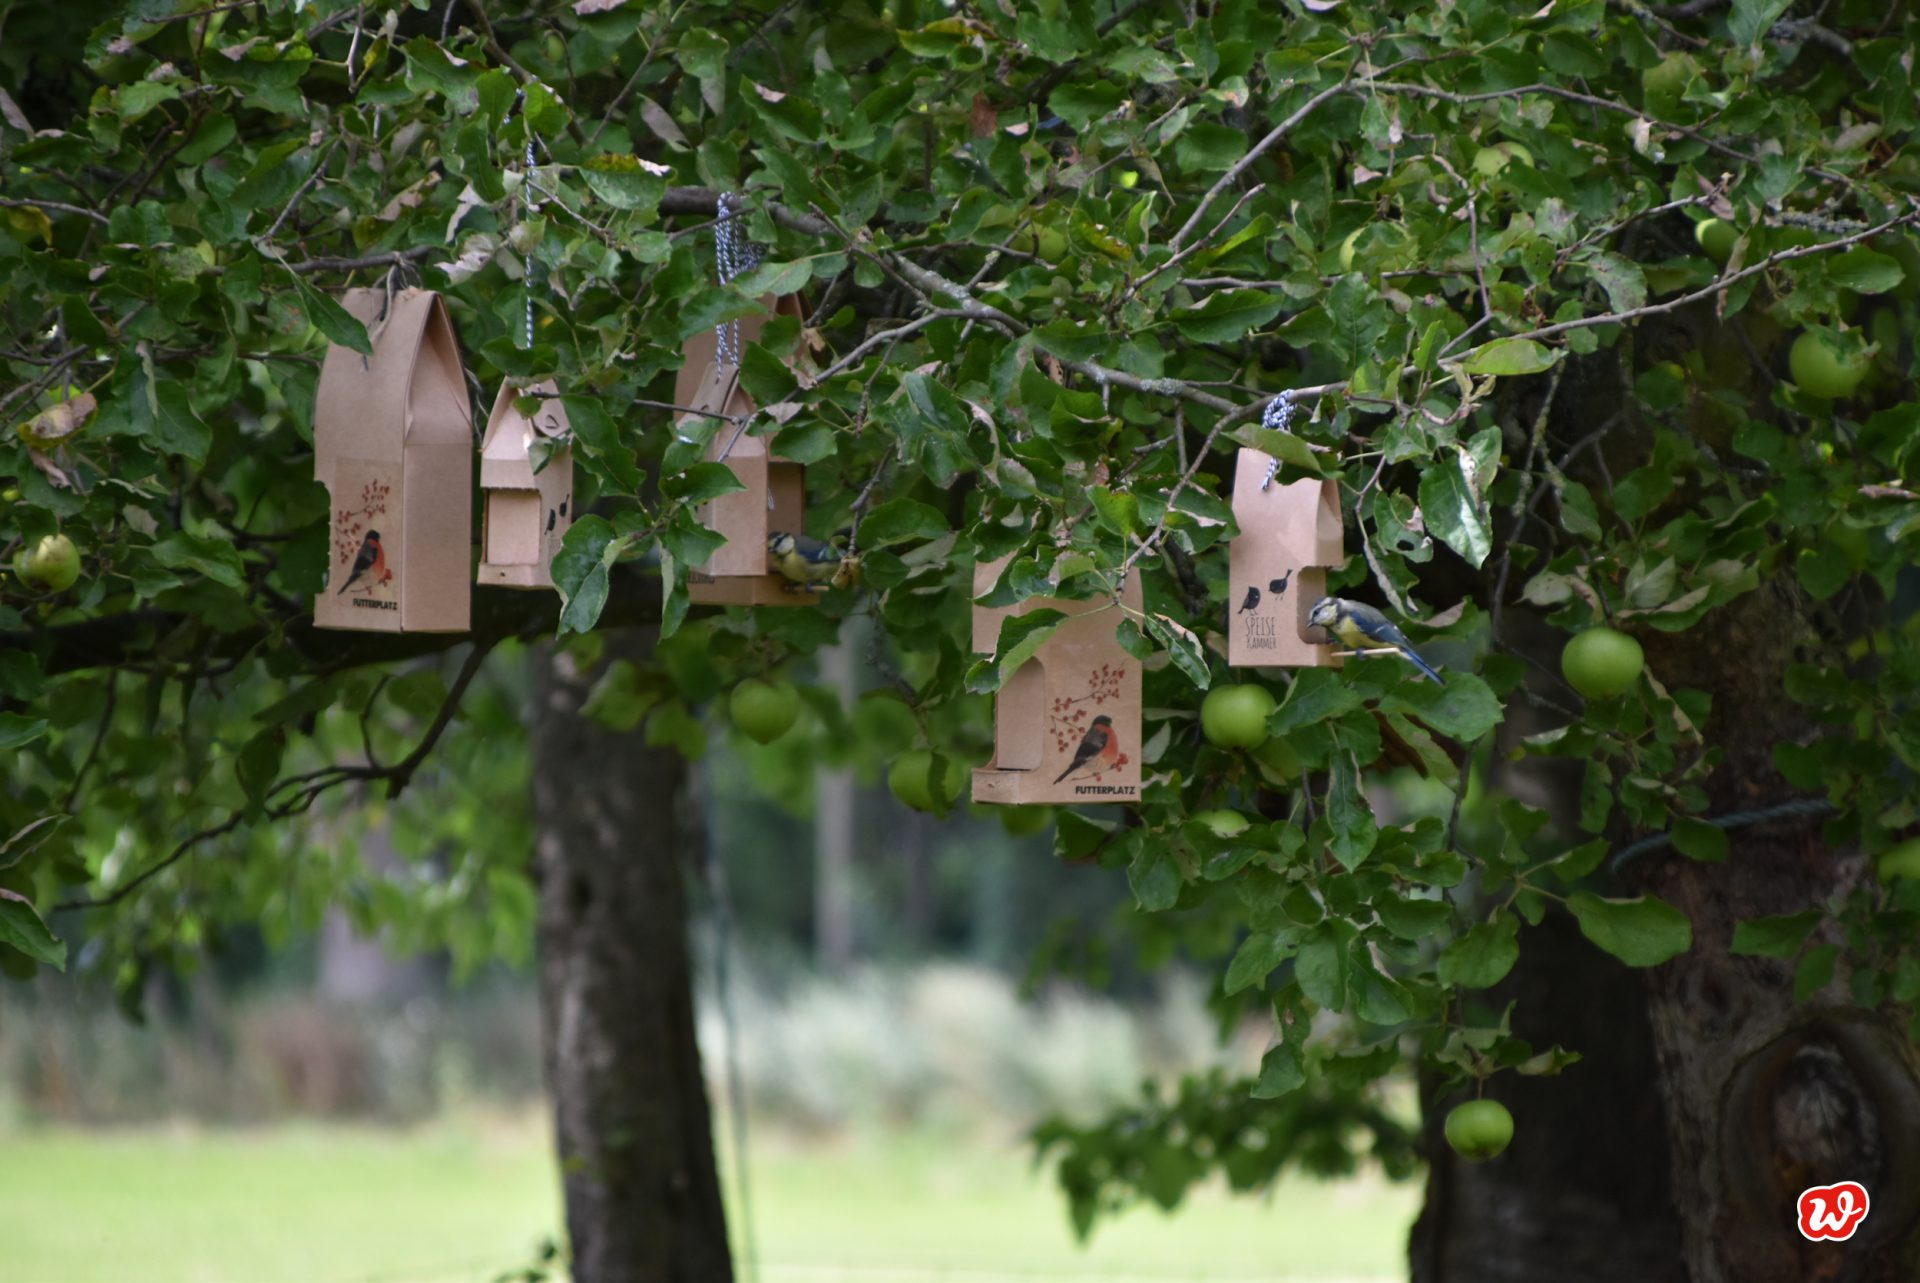 Wunderle Wildvogelfutterhäuser in Apfelbaum